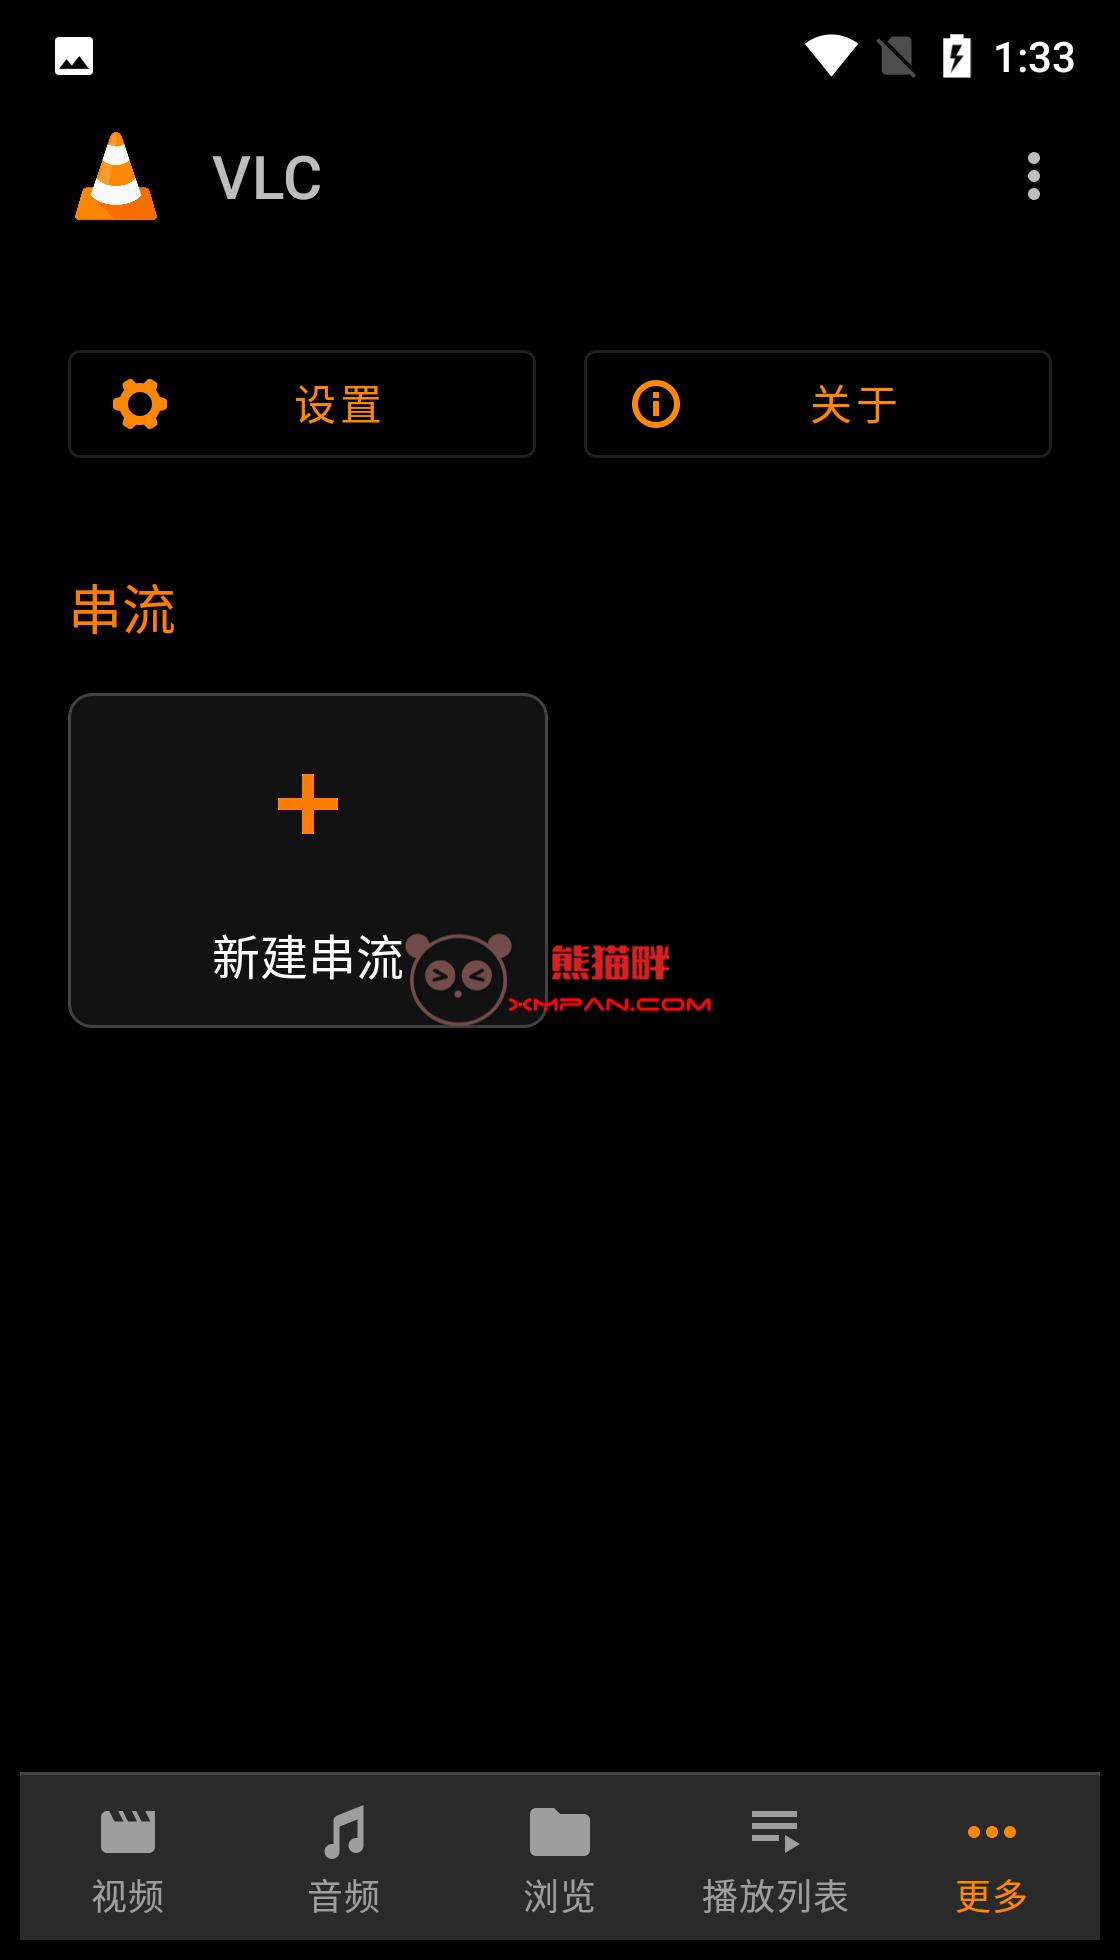 Screenshot_20211013-013341.png